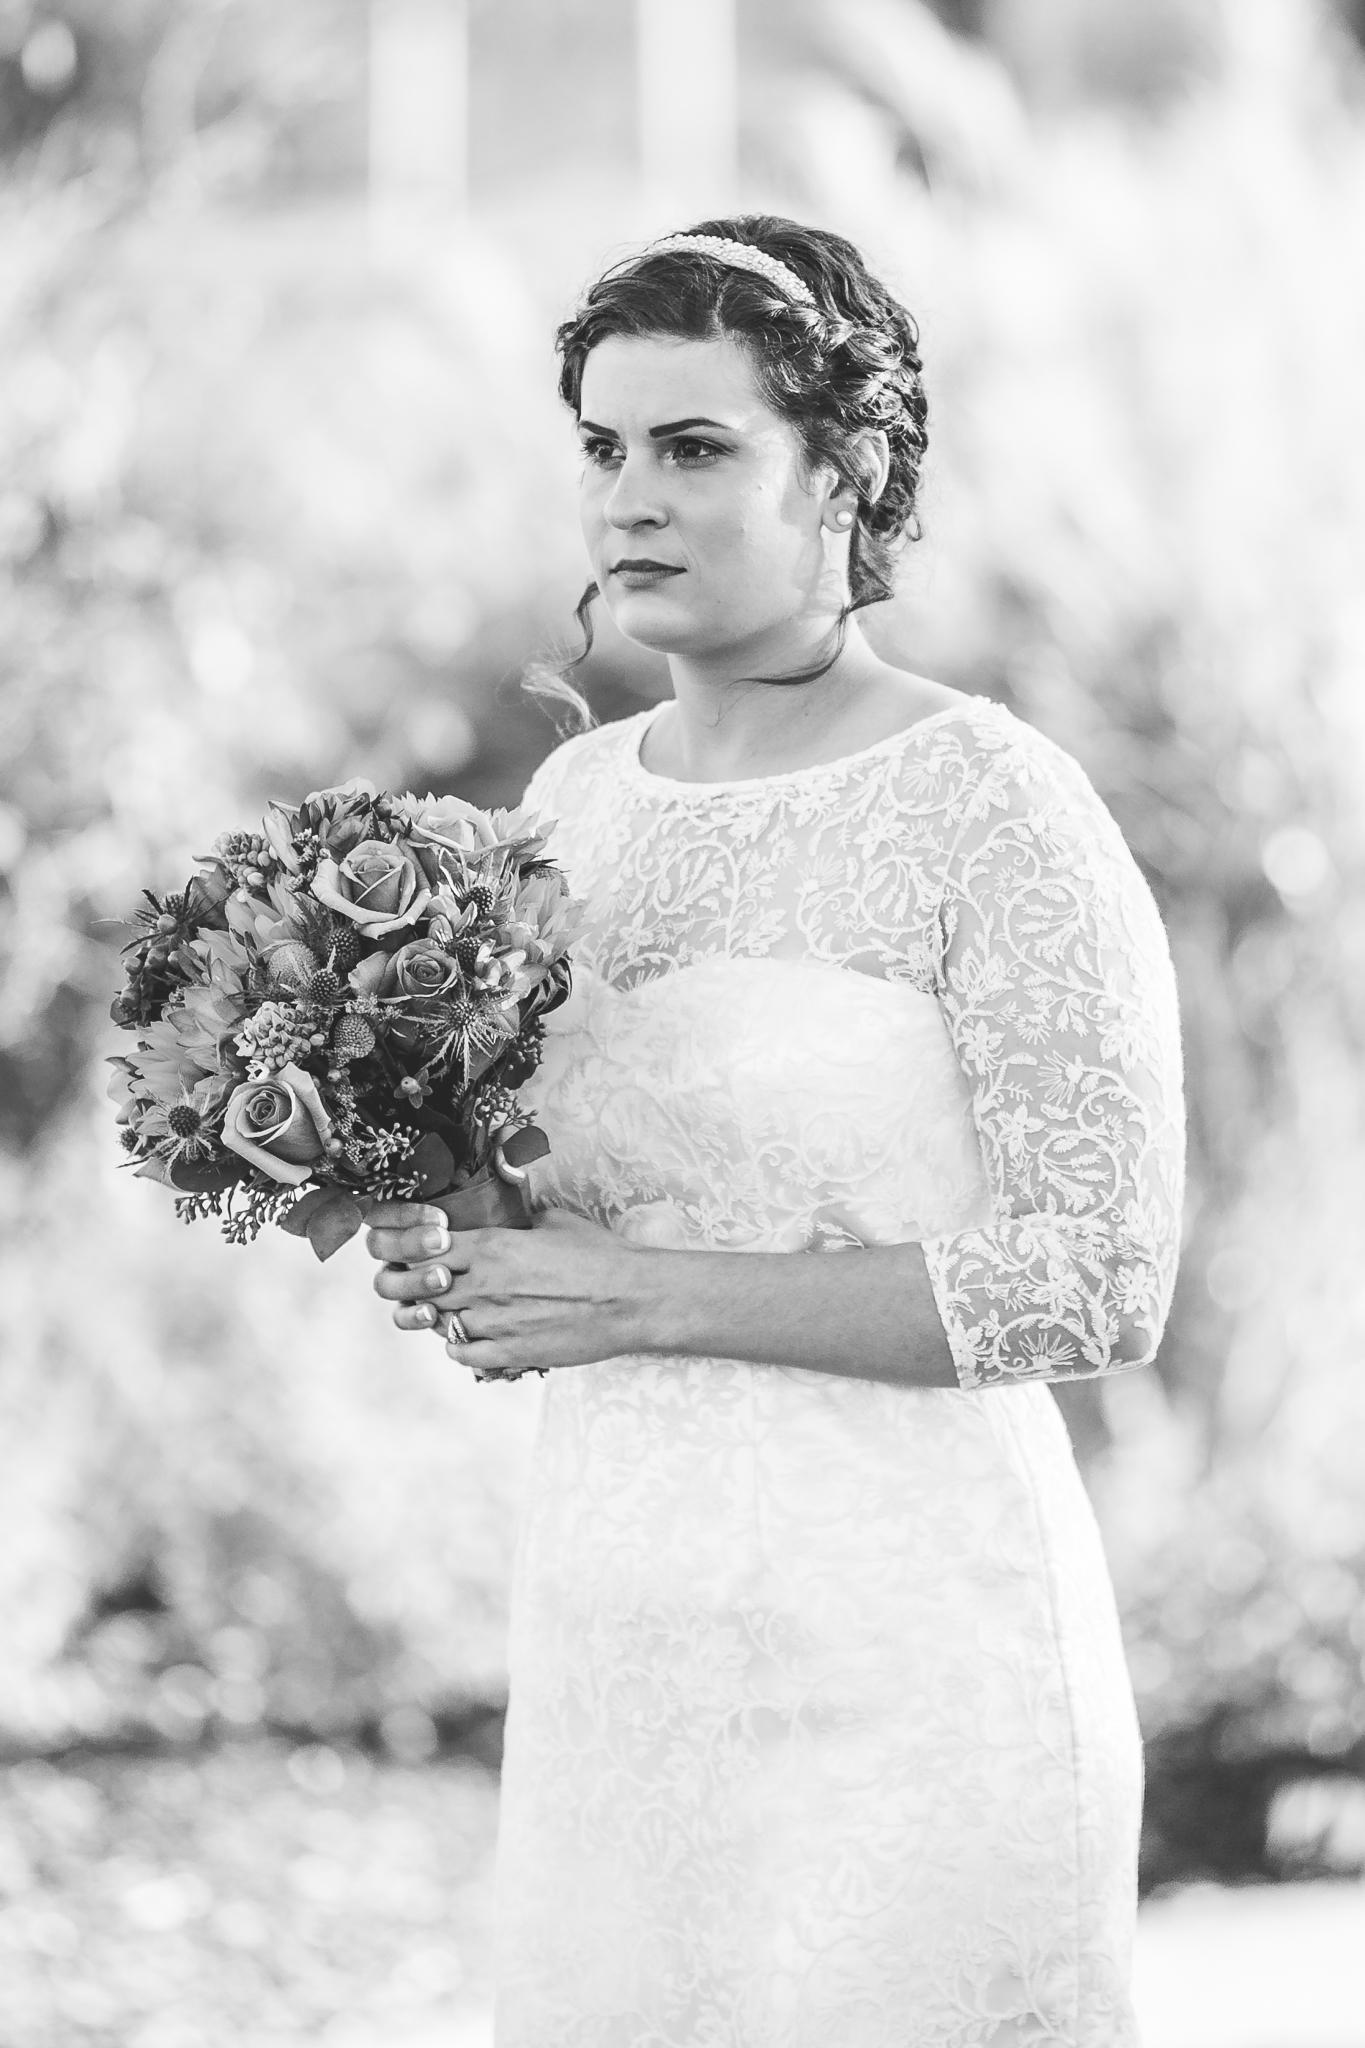 camuglia-whomstudio-chelsea_and_andy-nycphotographer-wedding-brooklyn-buffalo-timberlodge-022-5278.jpg